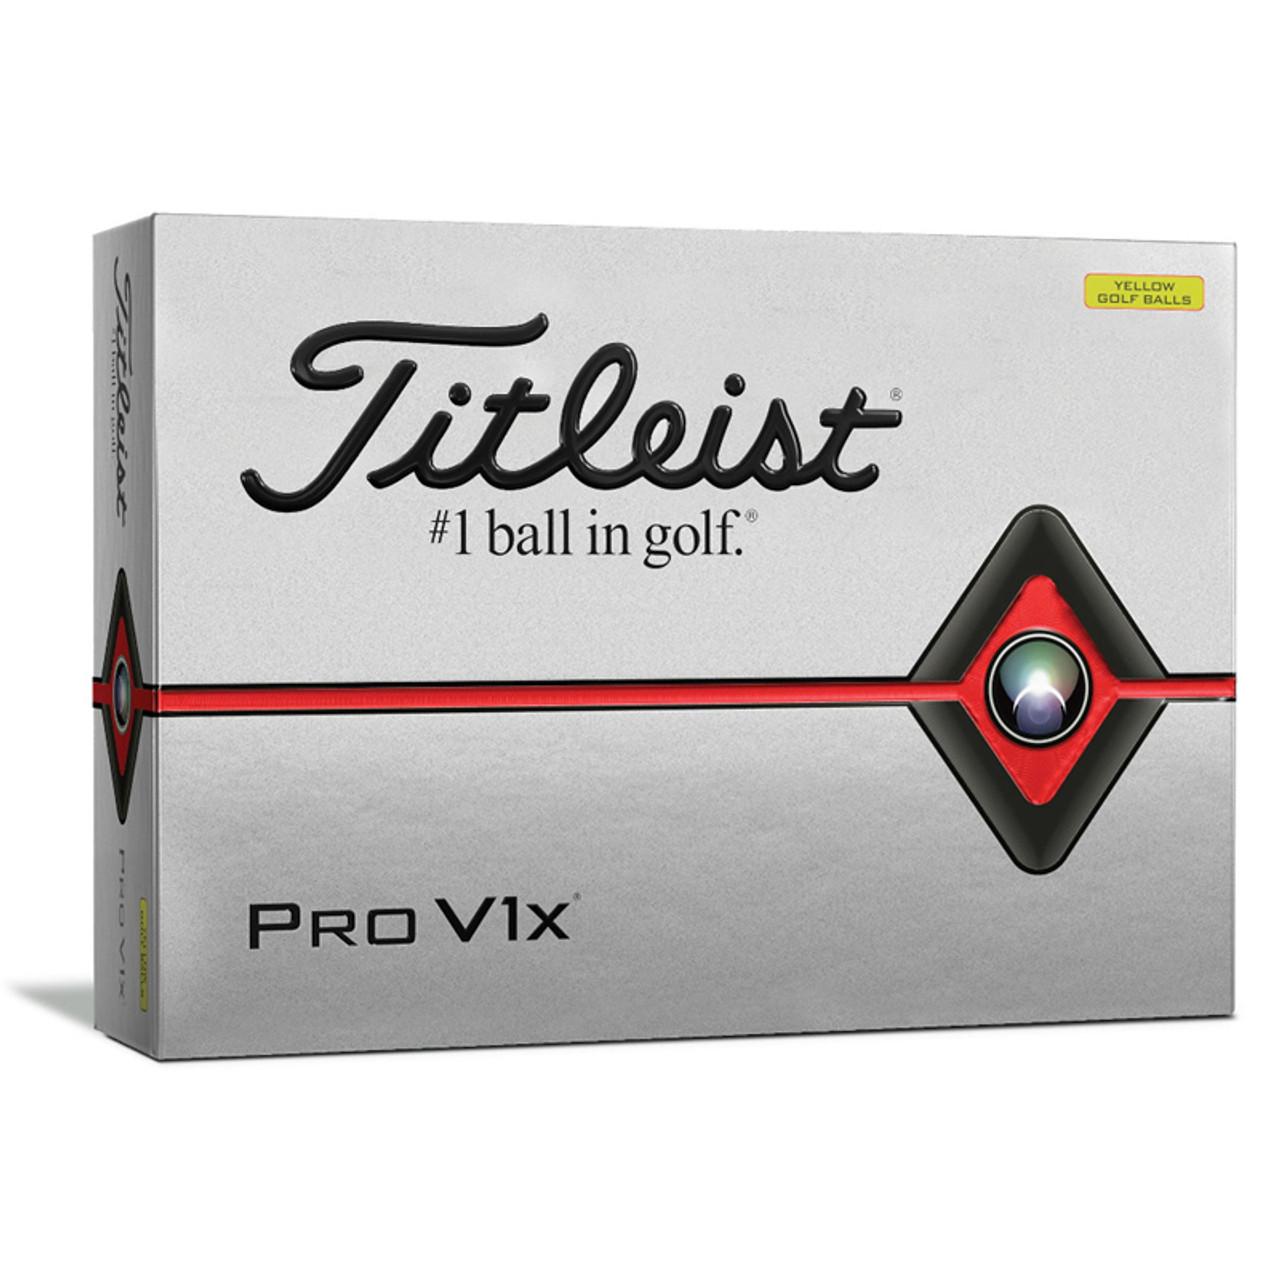 Titleist Personalized Pro V1x Yellow Dozen Golf Balls